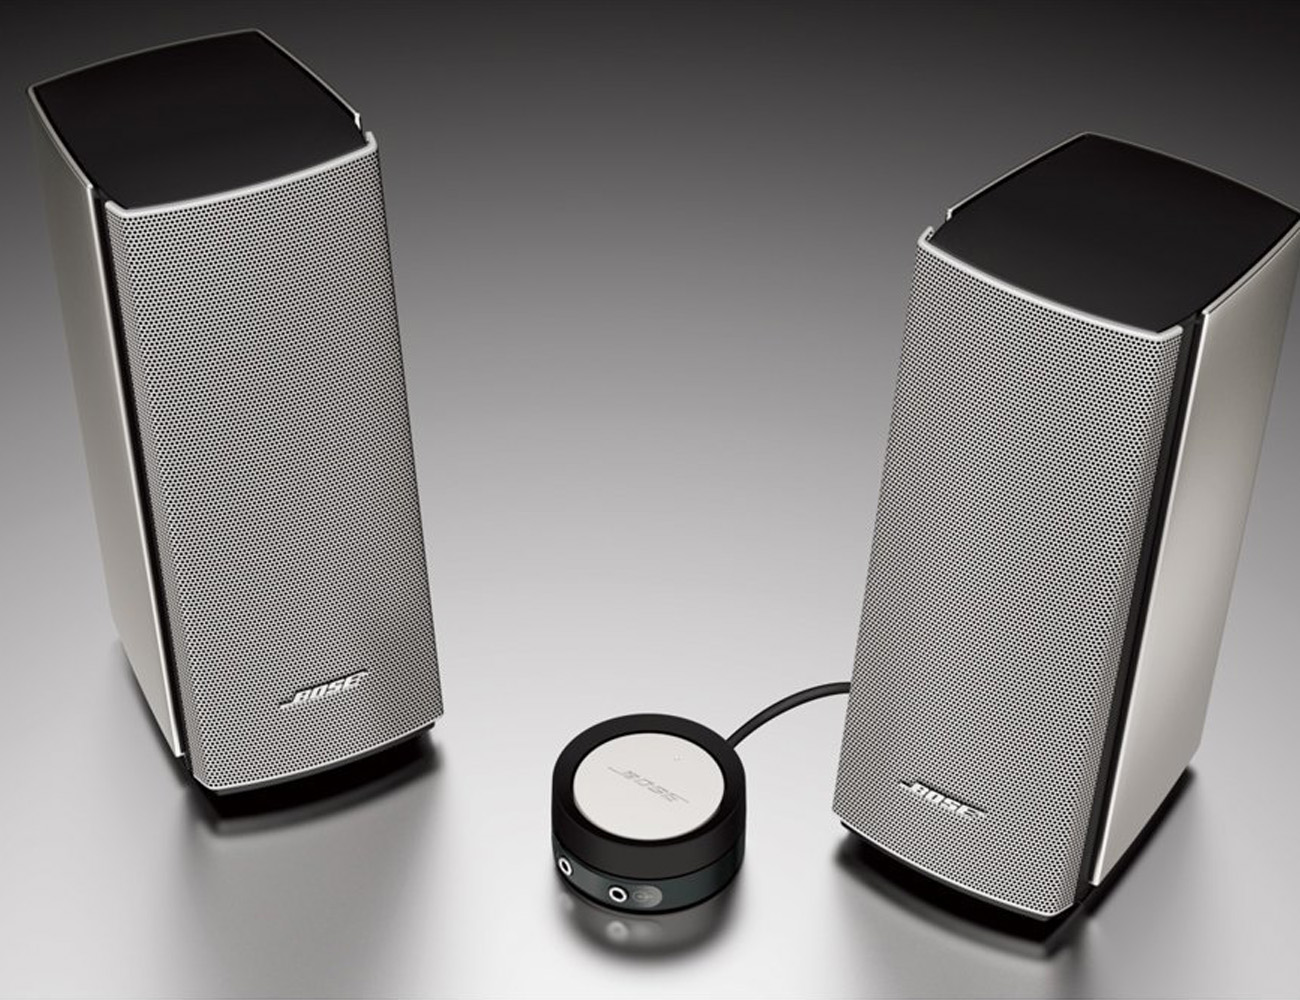 Bose Companion 20 Multimedia Speaker System » Gadget Flow